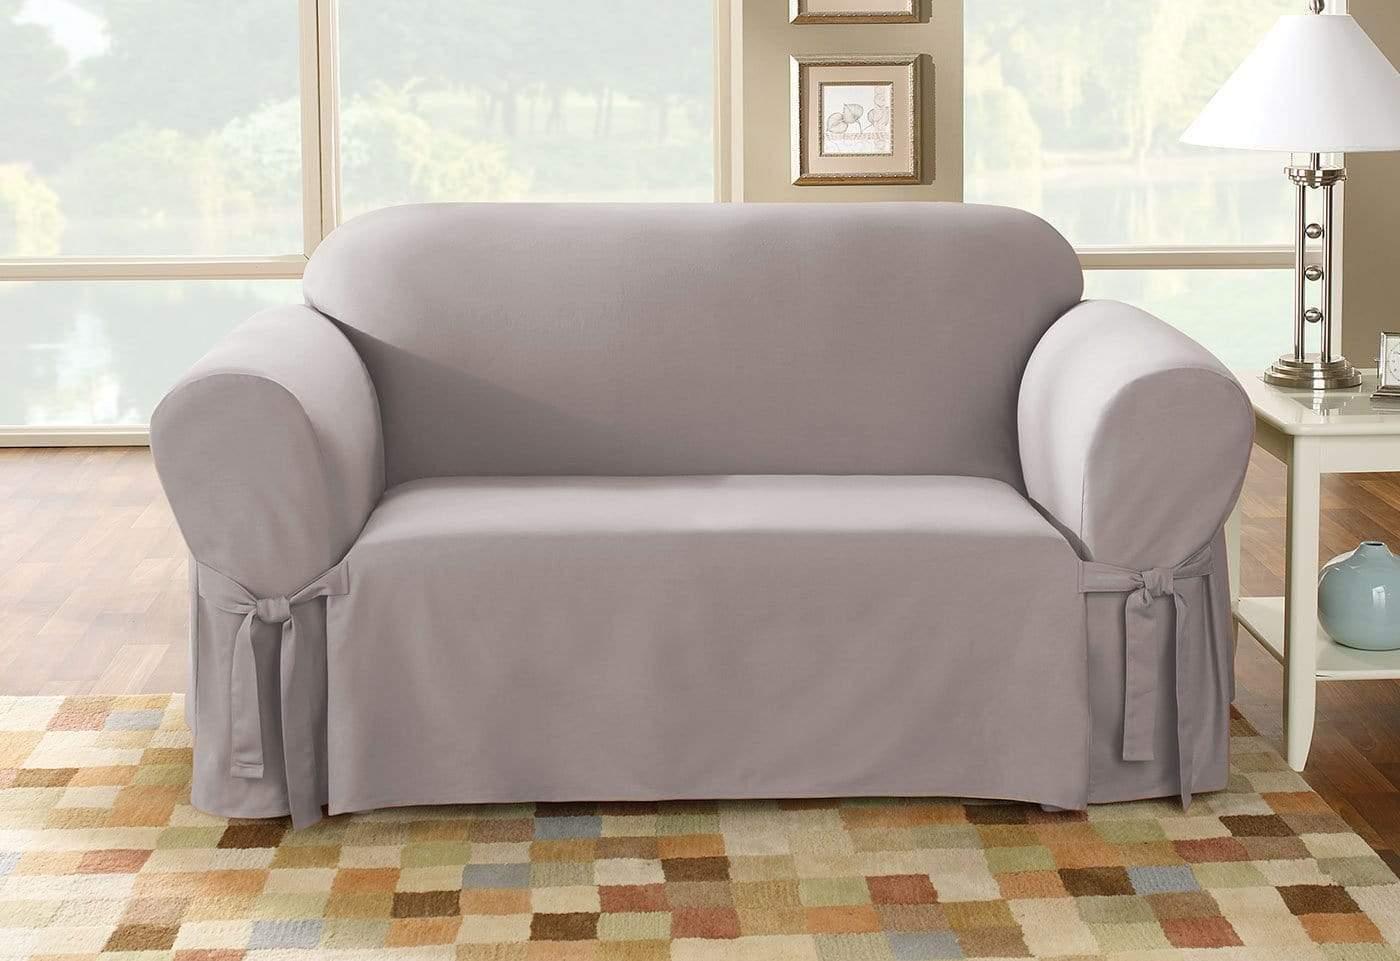 durham one piece sofa slipcover grey leather modern cotton duck loveseat surefit